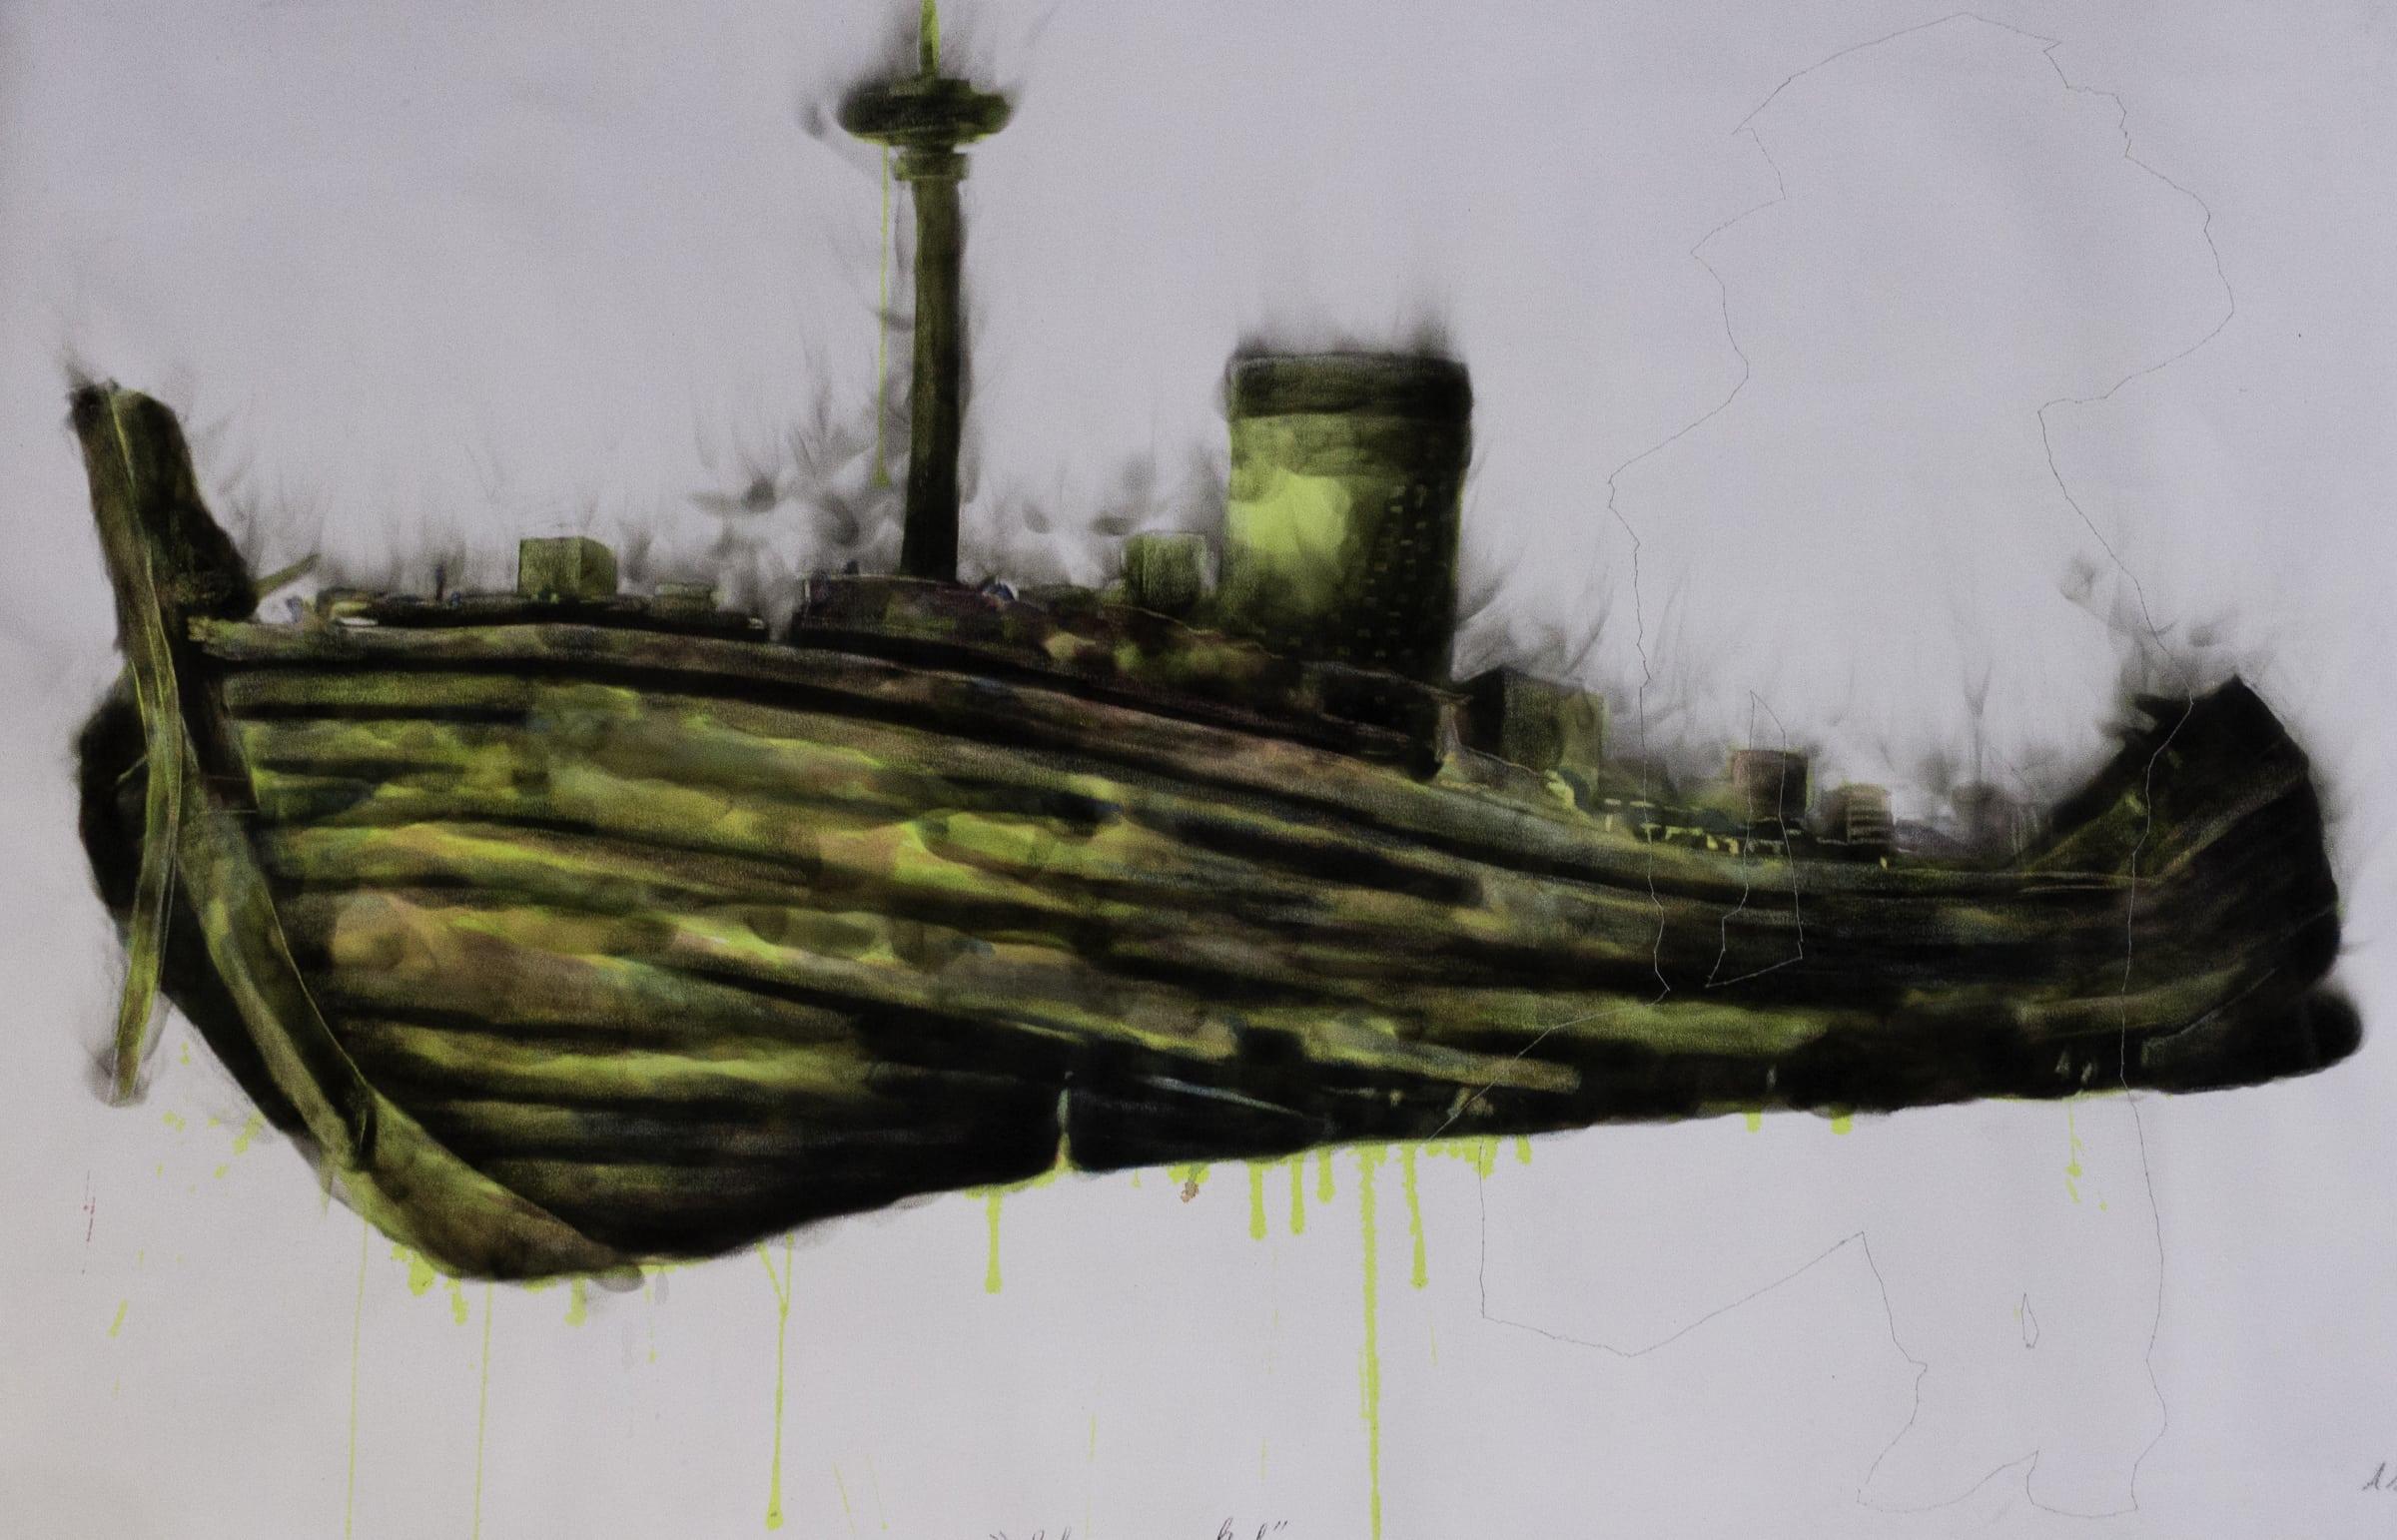 <span class=&#34;link fancybox-details-link&#34;><a href=&#34;/artists/54-azael-langa/works/3298-azael-langa-shipwrecked-2019/&#34;>View Detail Page</a></span><div class=&#34;artist&#34;><strong>Azael Langa</strong></div> <div class=&#34;title&#34;><em>Shipwrecked</em>, 2019</div> <div class=&#34;medium&#34;>Smoke, Ink And String On Canvas</div> <div class=&#34;dimensions&#34;>119cm x 162cm (138.5cm x 181.5cm framed)</div>